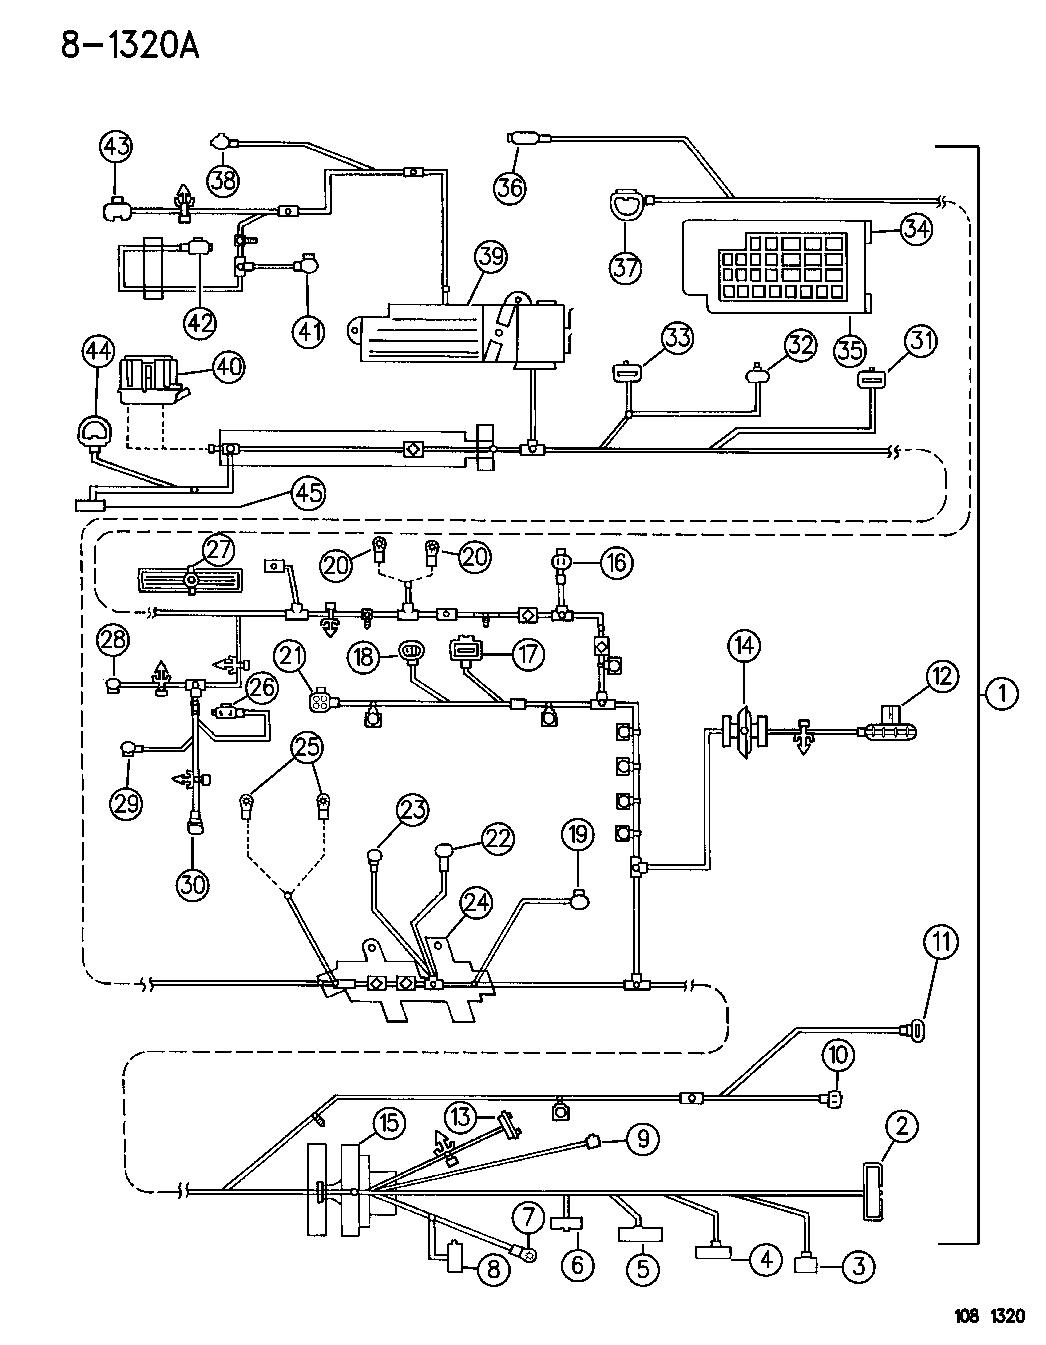 1996 dodge stratus wiring diagram wiring library1996 dodge stratus wiring headlamp to dash